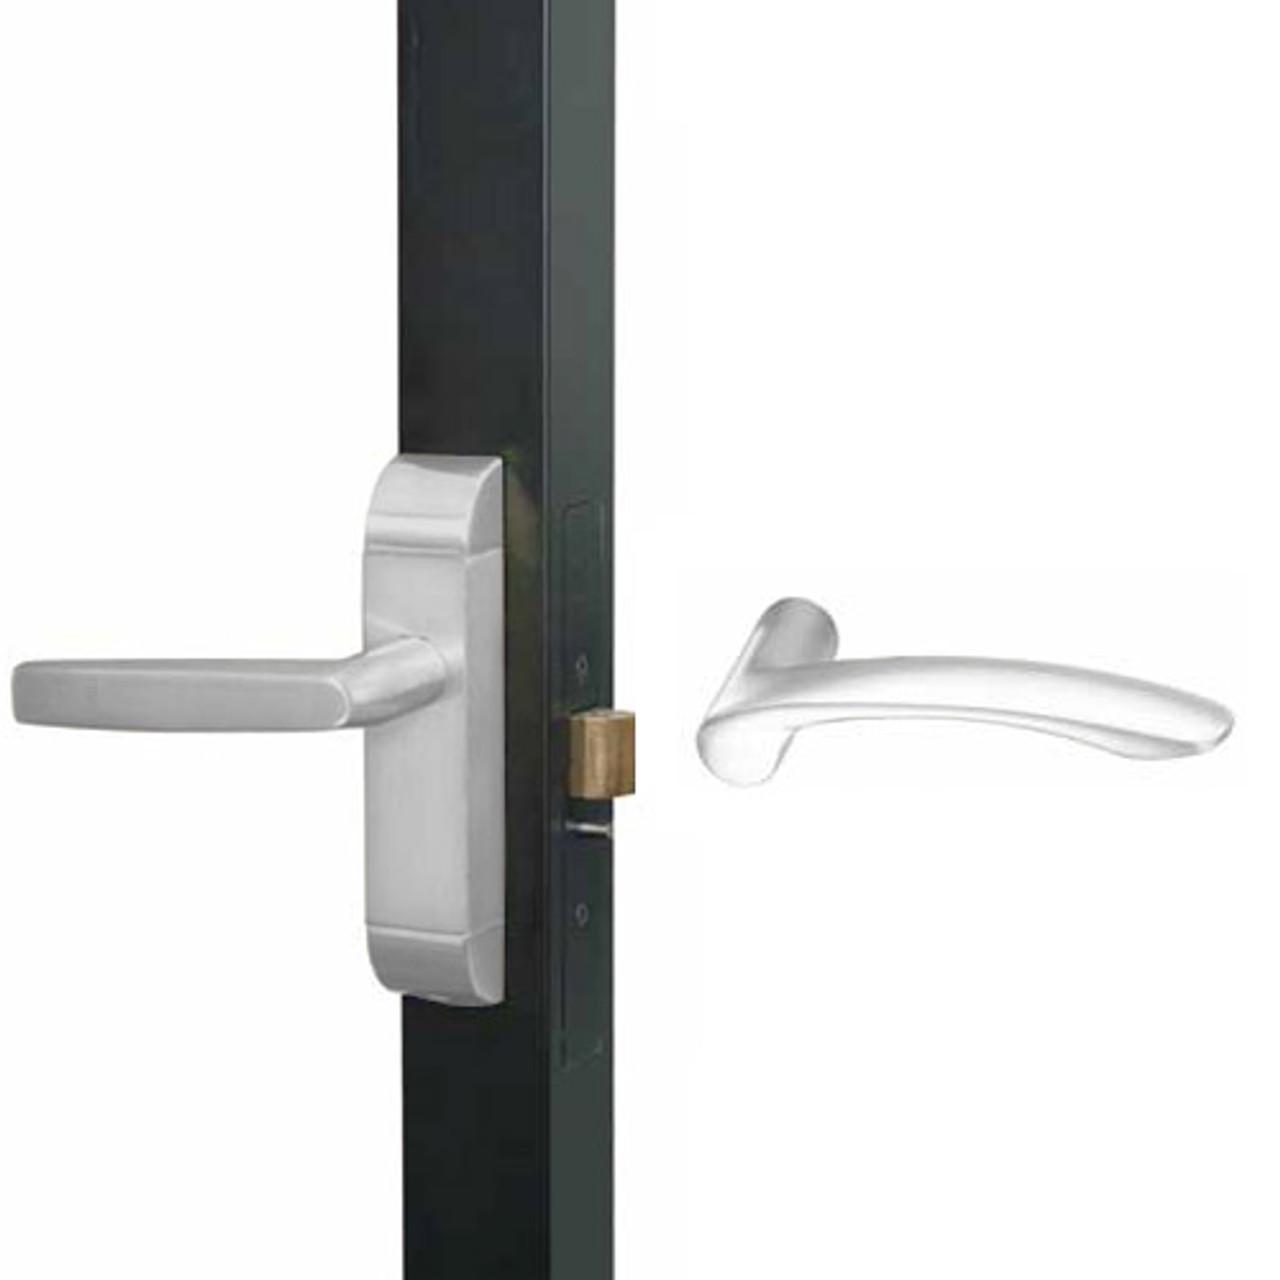 4600-MV-512-US32 Adams Rite MV Designer Deadlatch handle in Bright Stainless Finish